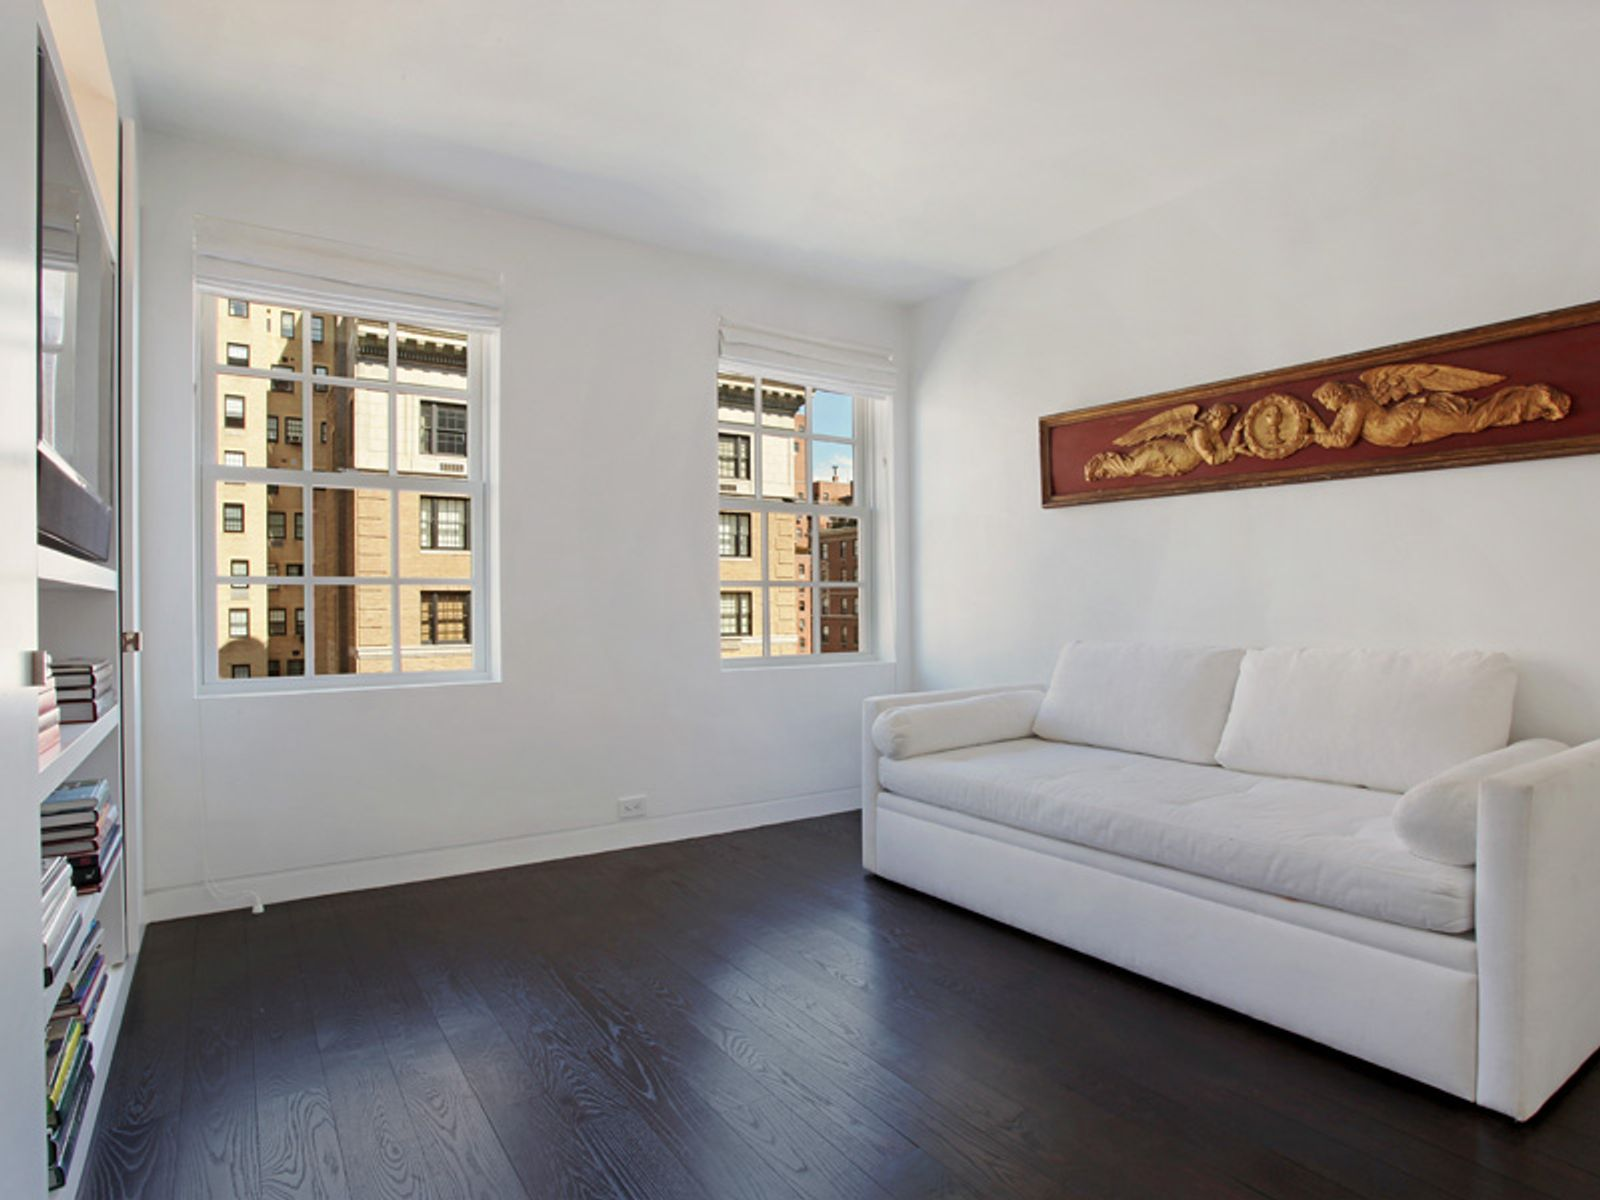 52 East 72nd Street, 15th Floor